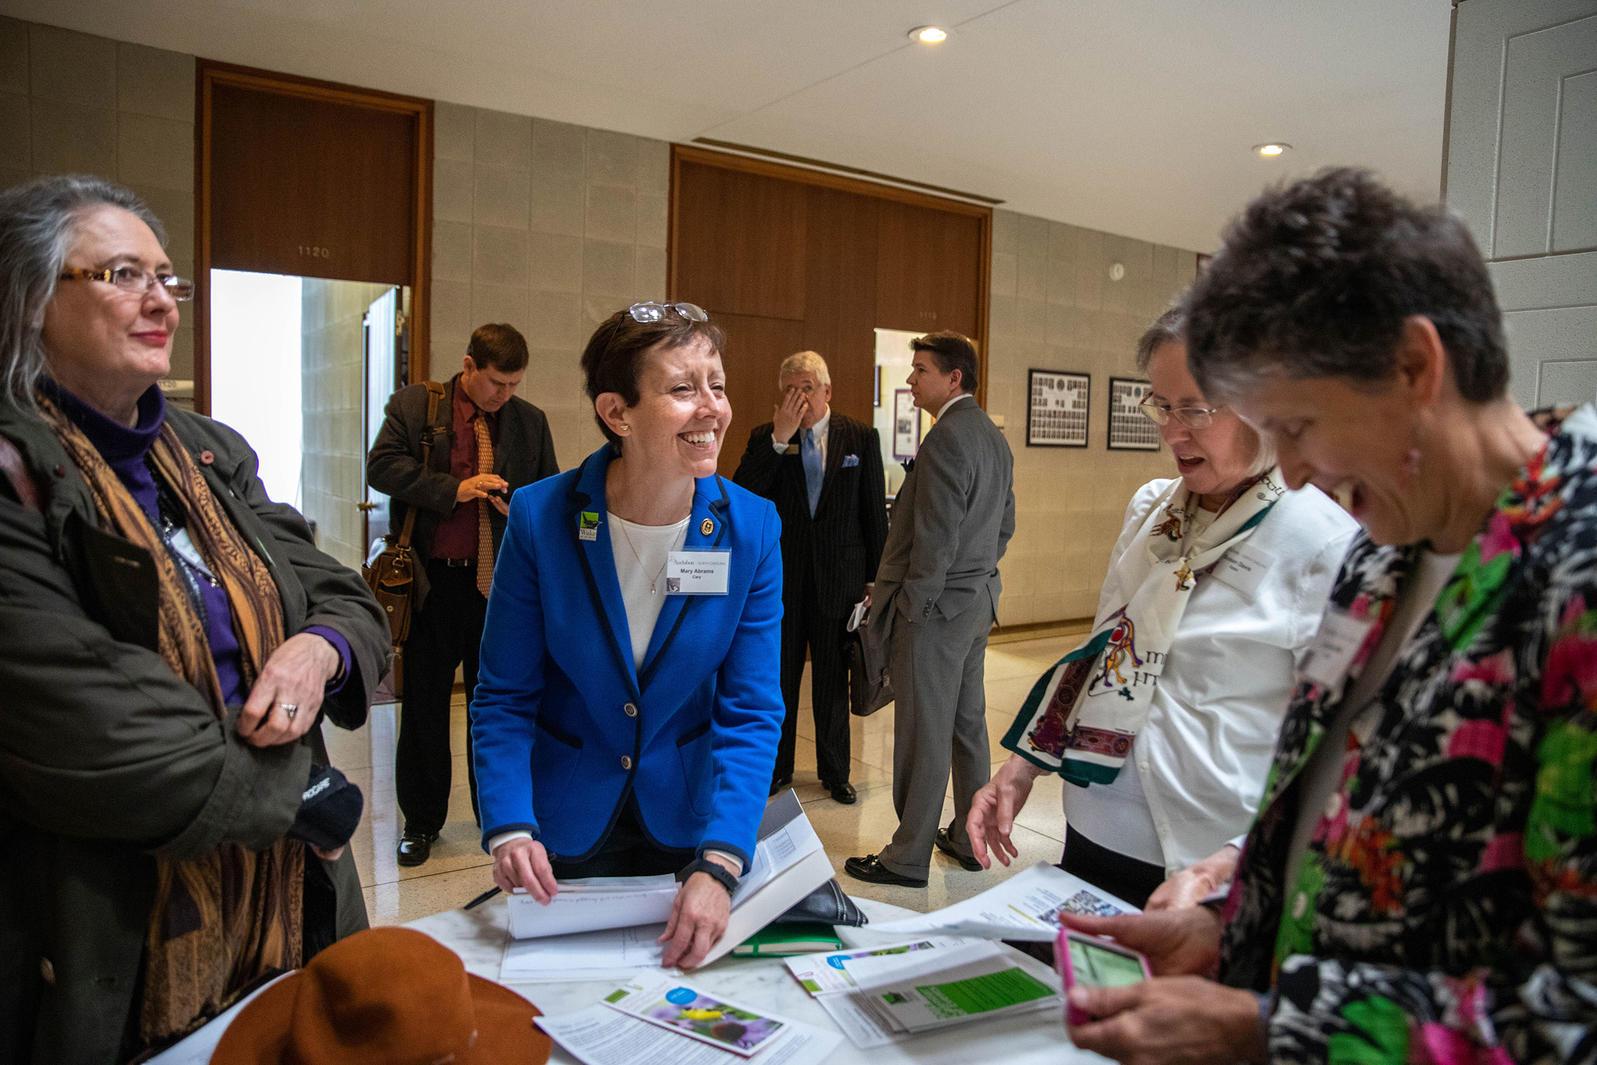 Mary Abrams, Audubon ambassador and member of Wake Audubon, debriefs her fellow constituents prior to meeting their new senator, Wiley Nickel. Dominic Arenas/Audubon